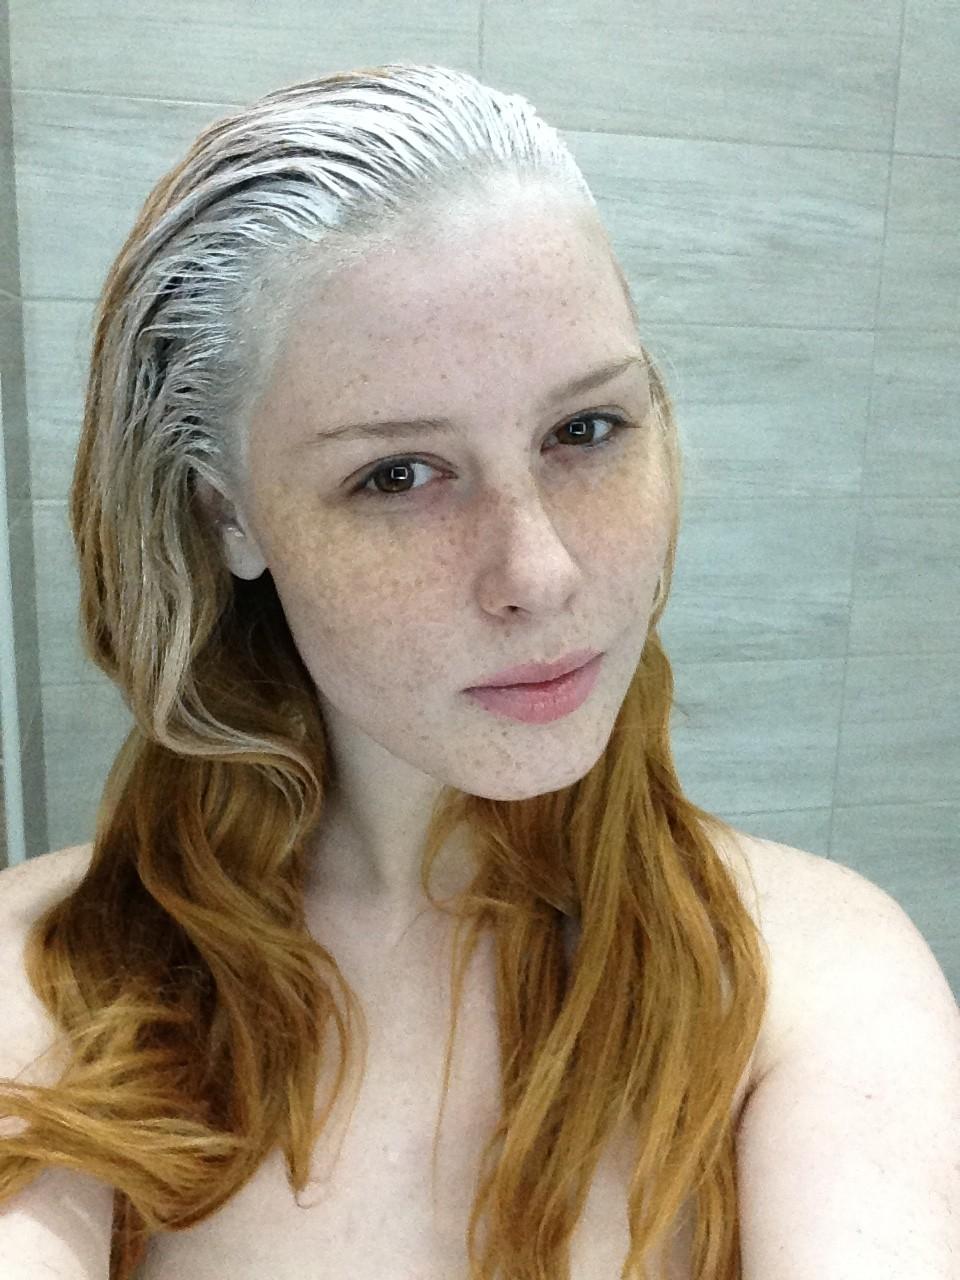 redhead photoshoot visage freckles cityflower